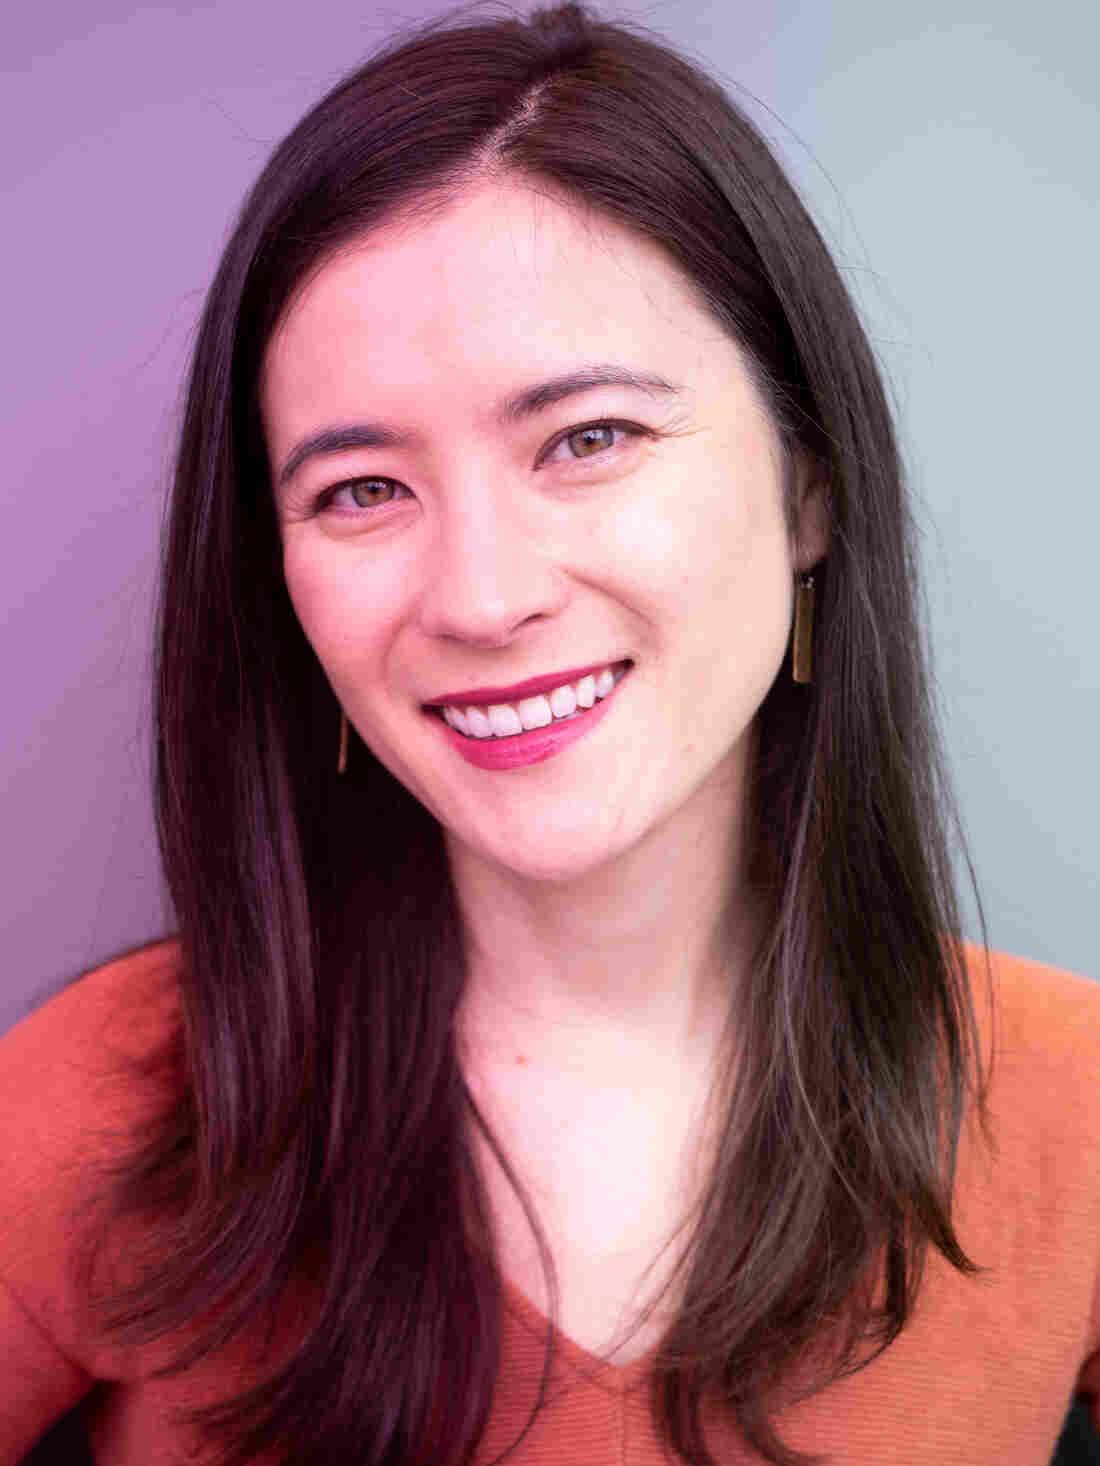 Lauren Migaki